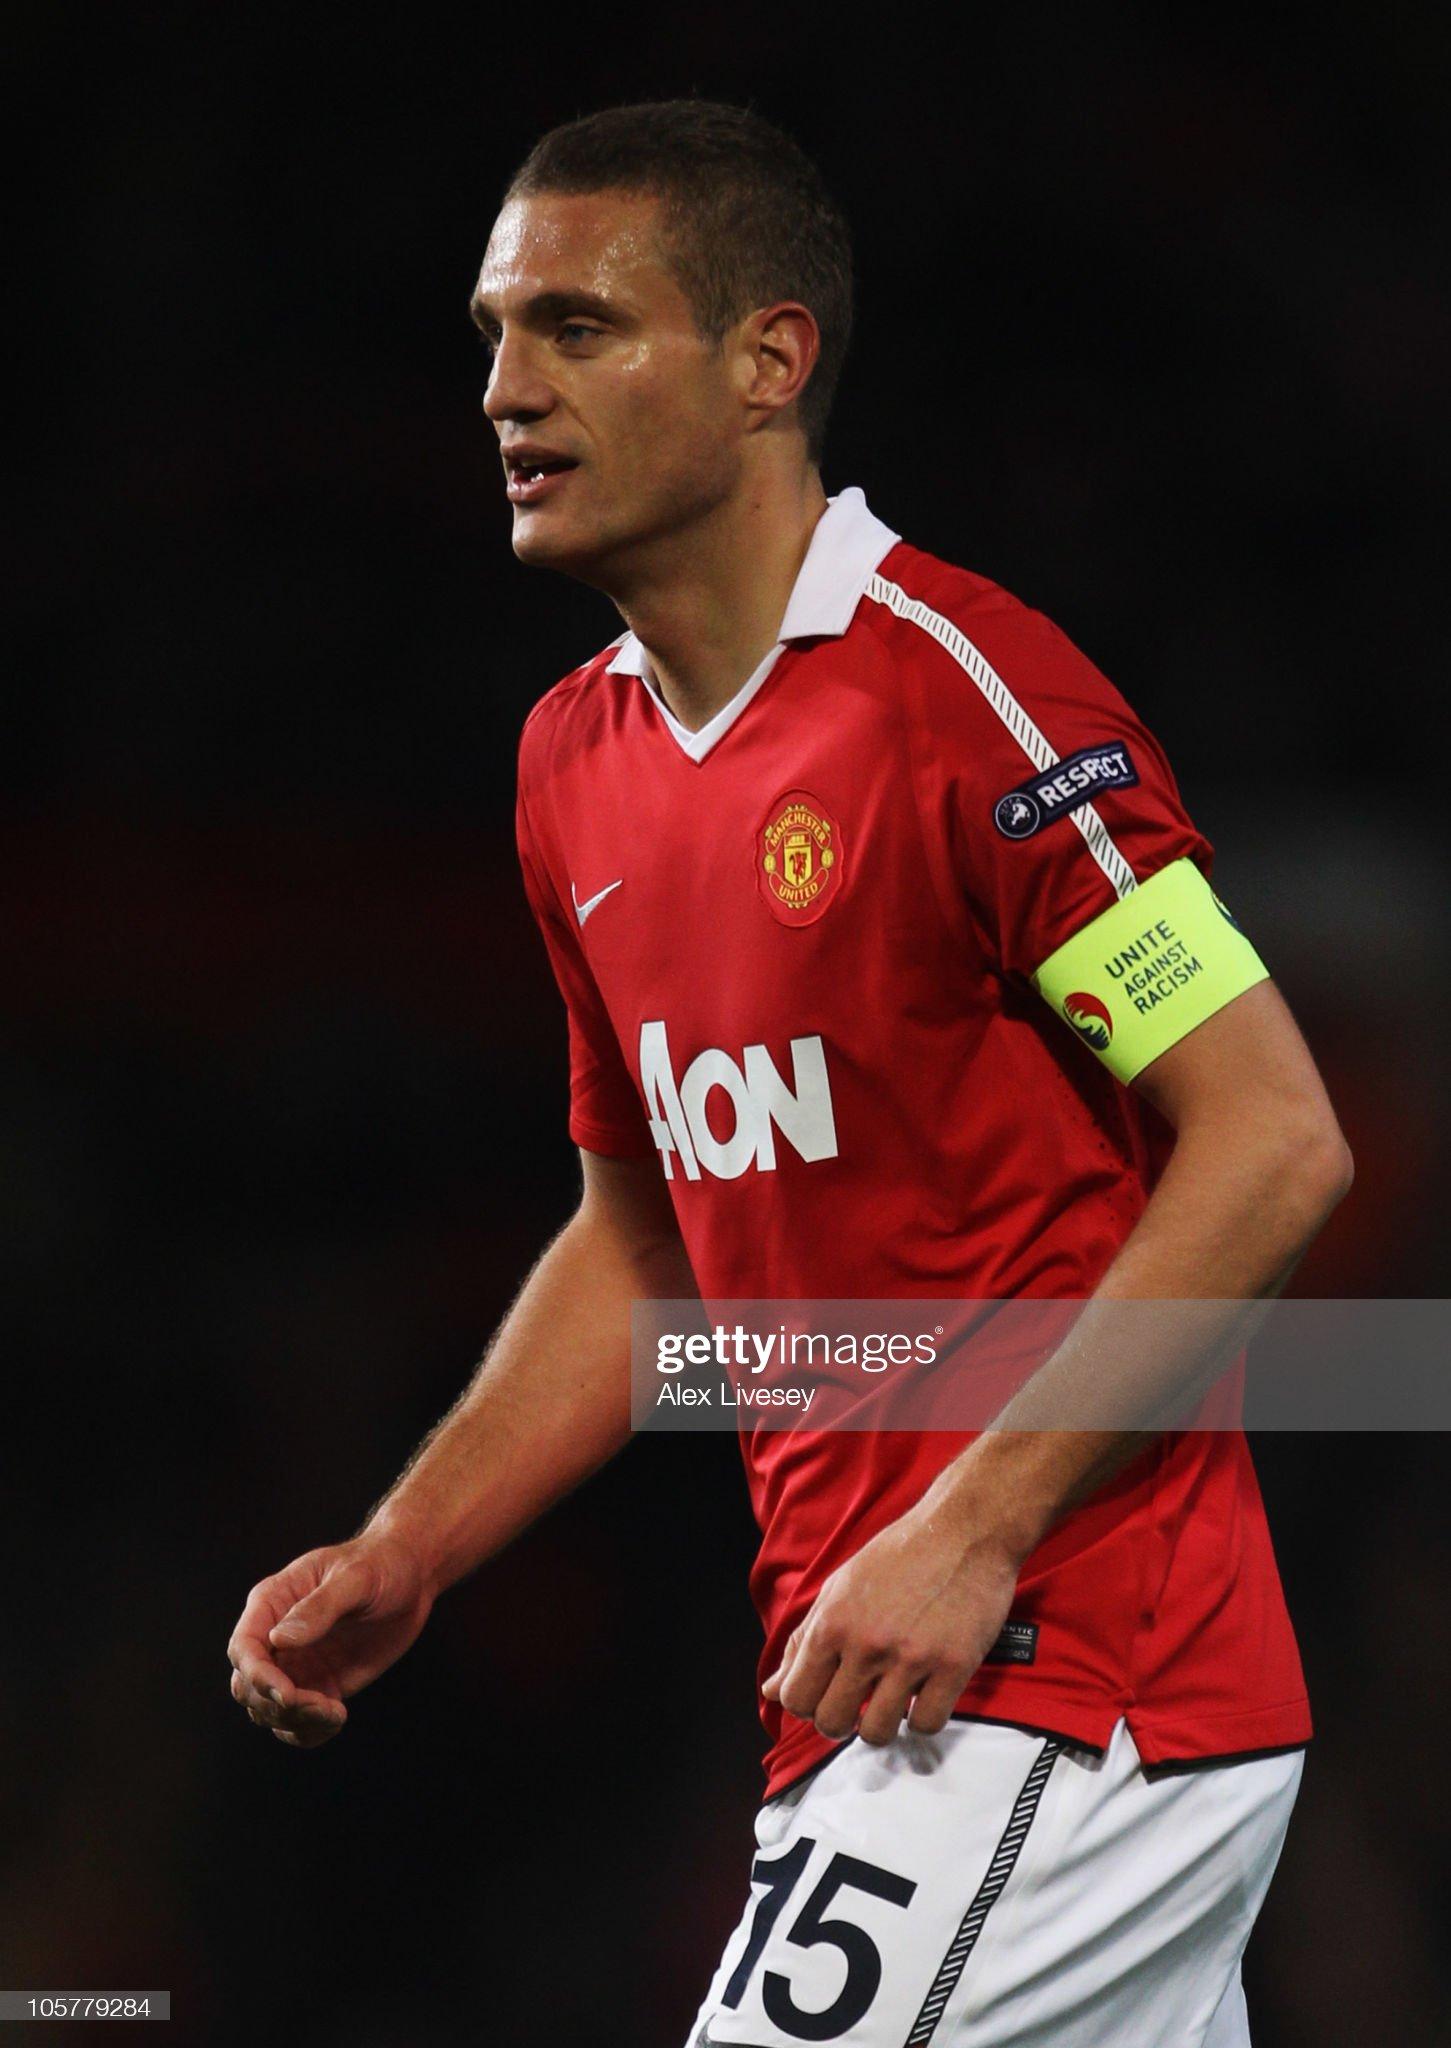 ¿Cuánto mide Nemanja Vidic? - Altura - Real height Captain-nemanja-vidic-of-manchester-unitedlooks-on-during-the-uefa-picture-id105779284?s=2048x2048